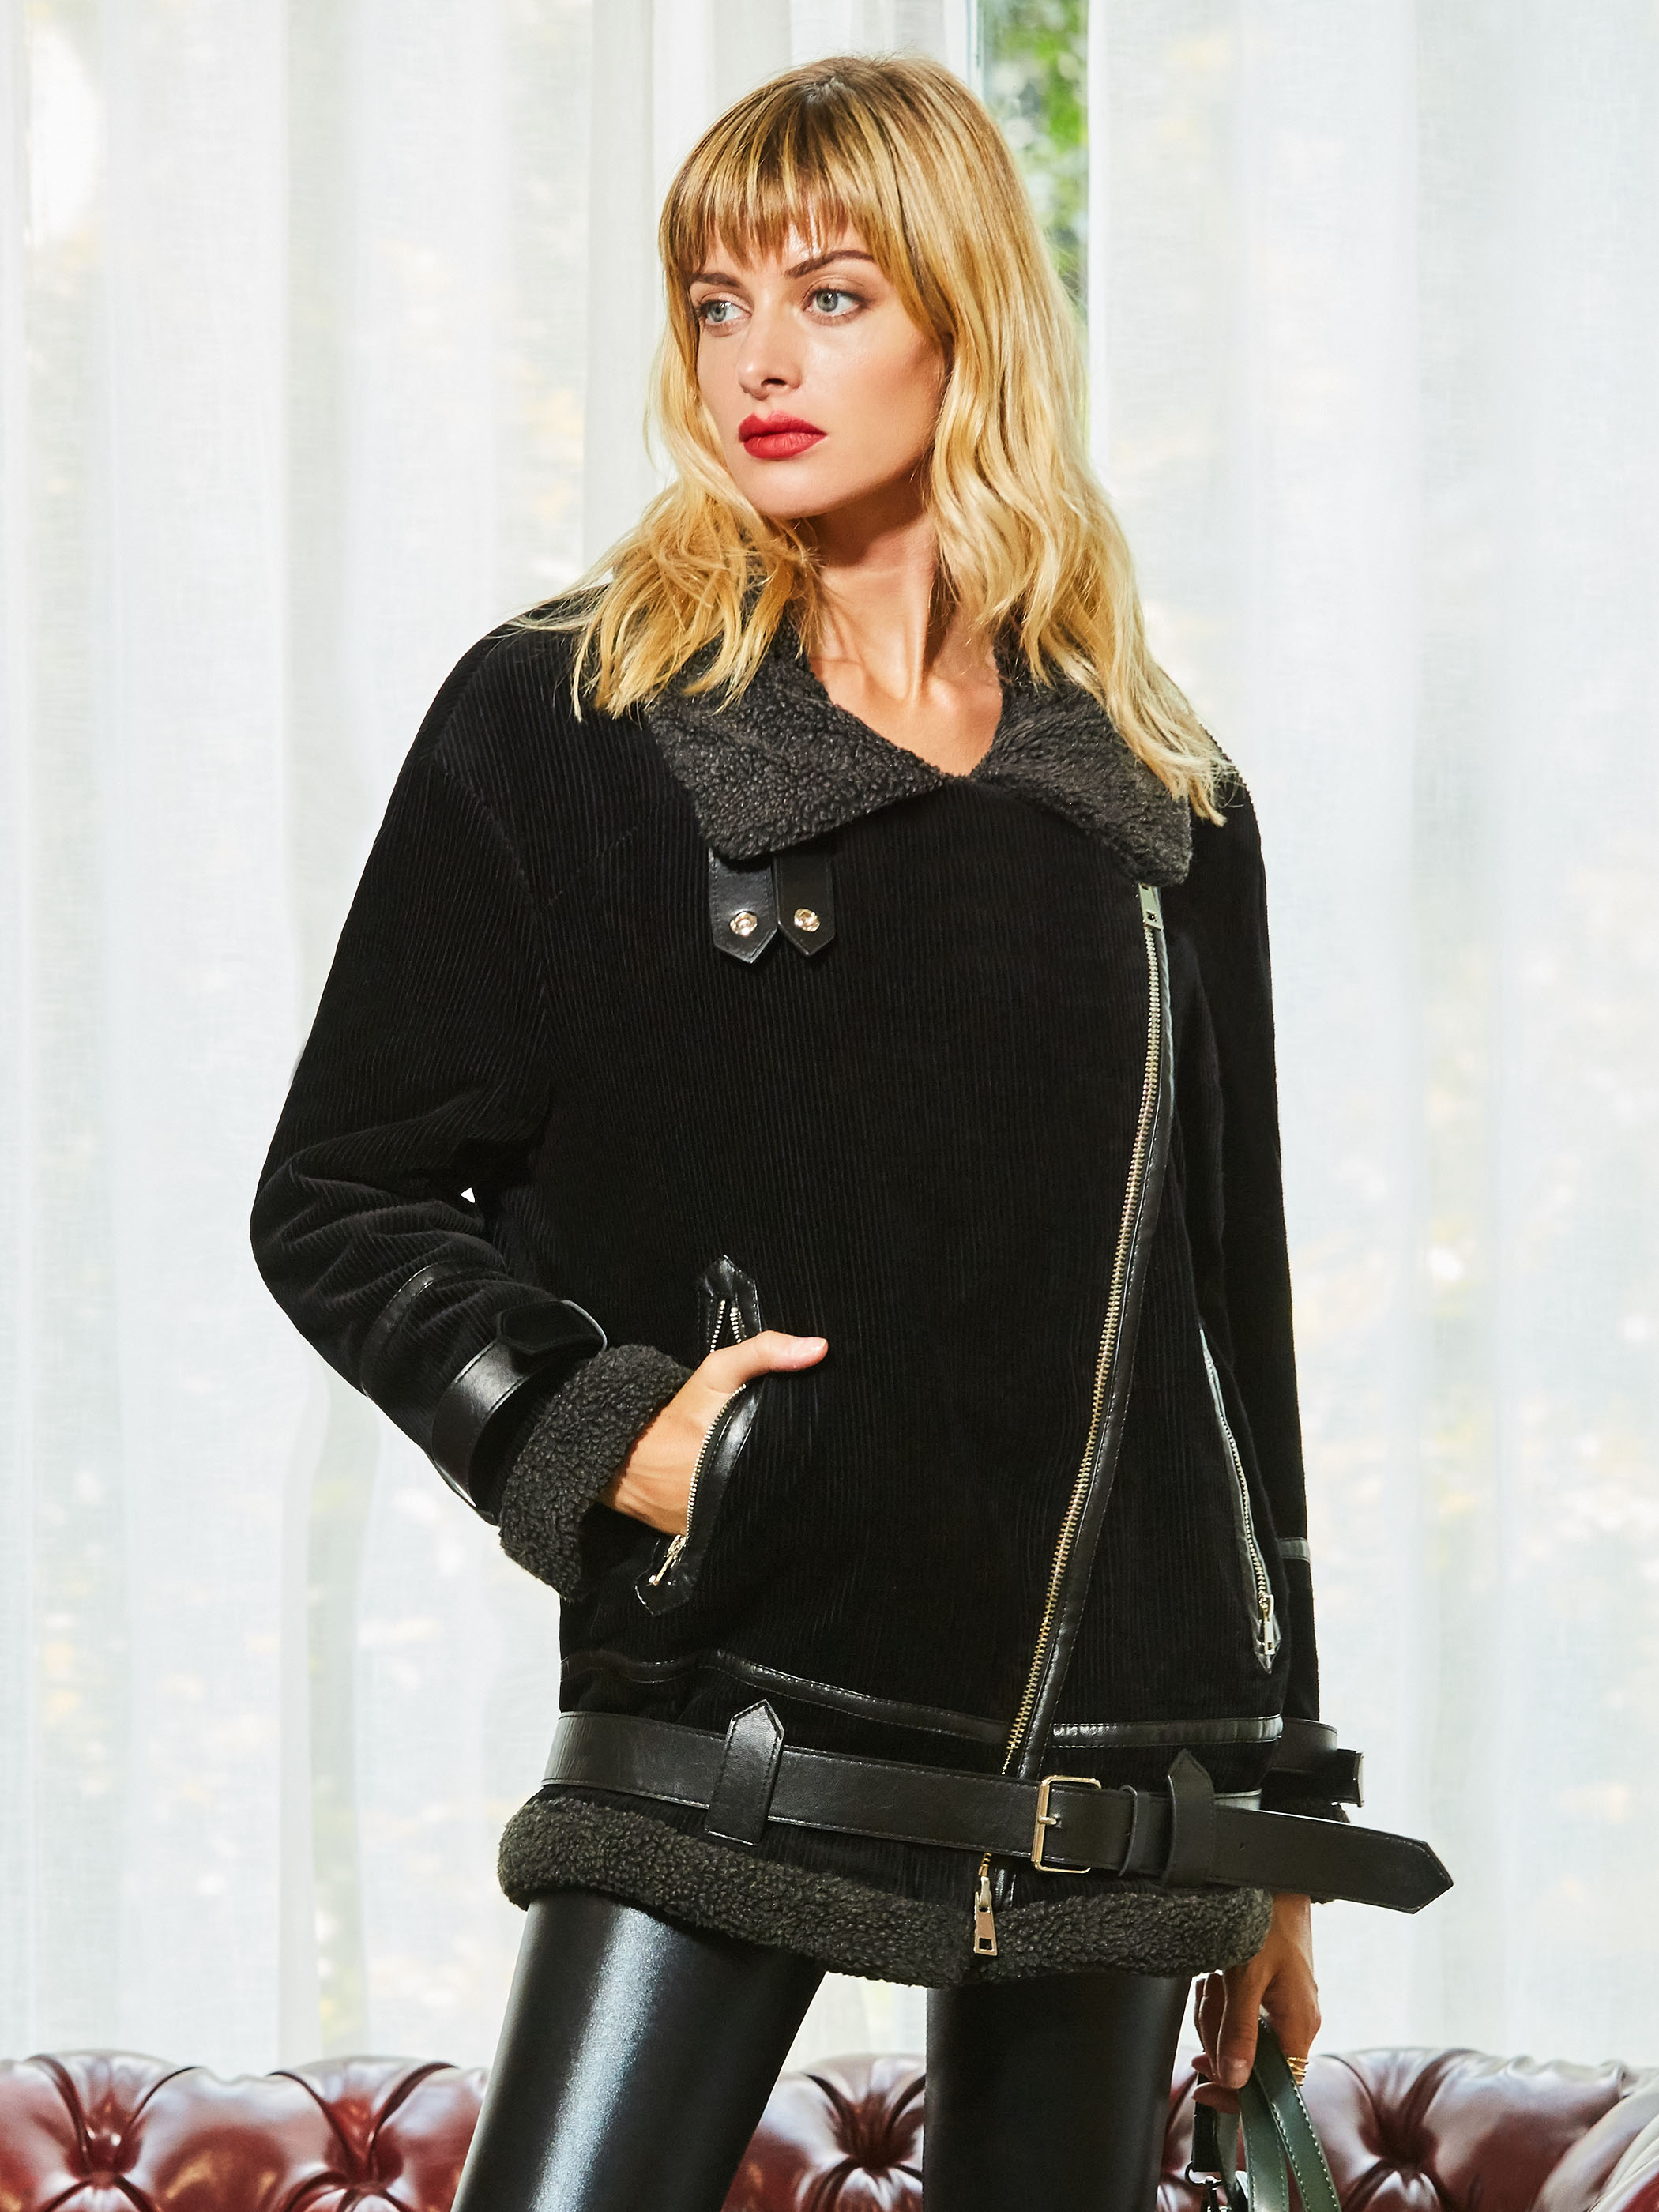 2018 New Fashion Women Autunm Winter Black Corduroy Jacket Lady Bomber Motorcycle Cool Outerwear Coat Belt Hot Sale